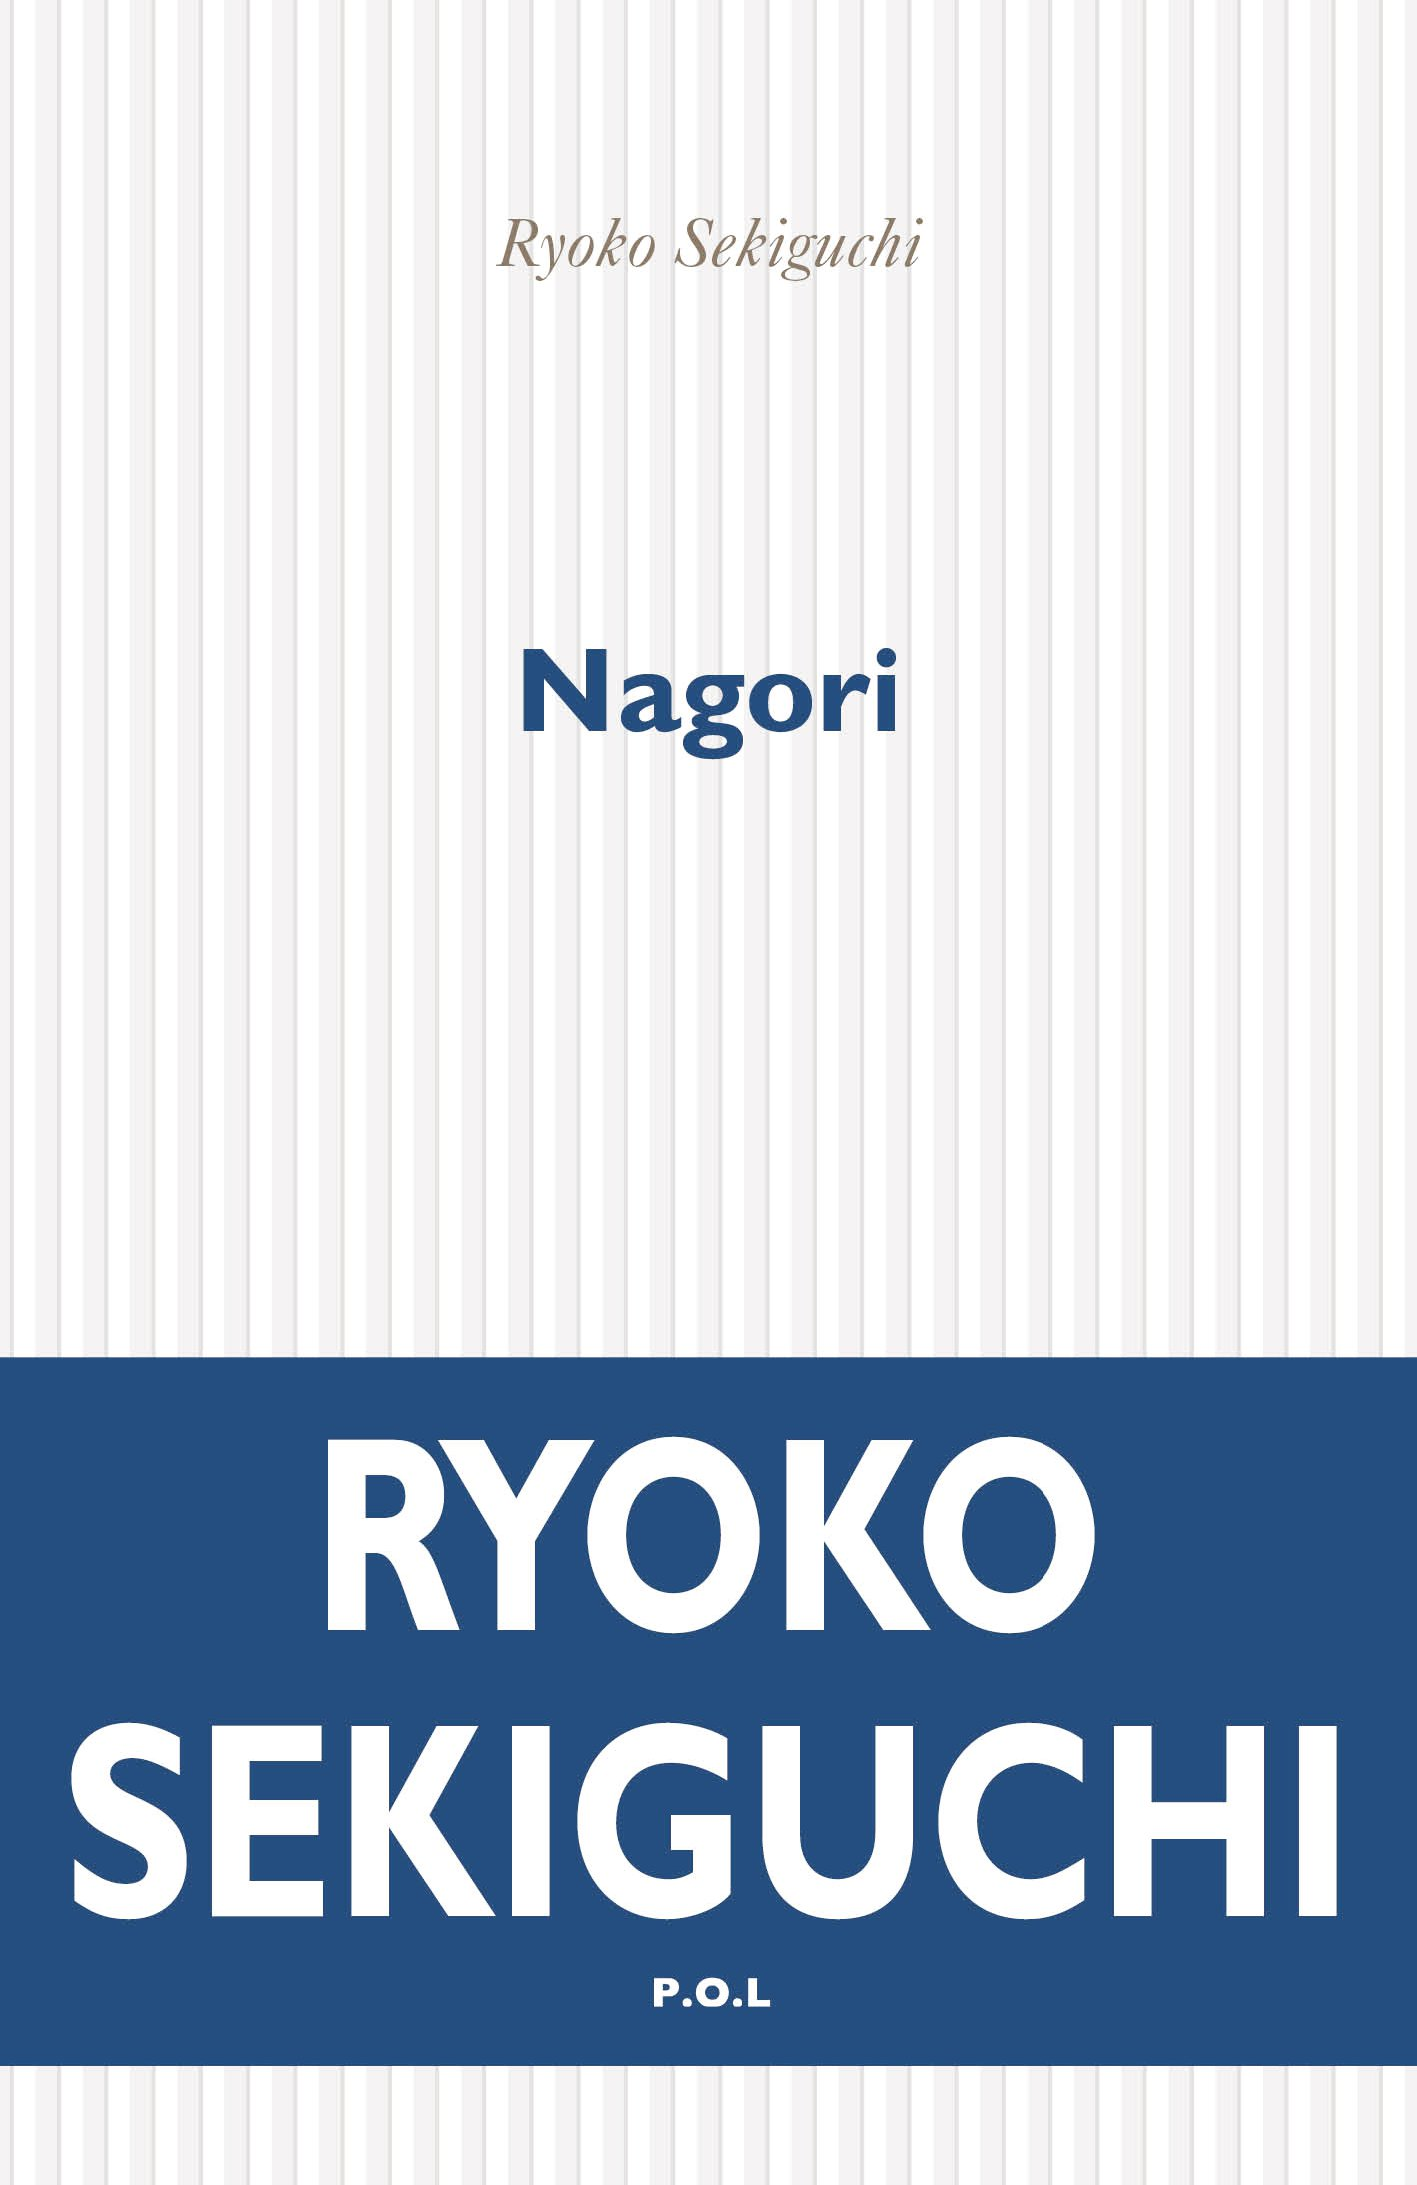 Nagori, la nostalgie de la saison qui s'en va | Sekiguchi, Ryoko